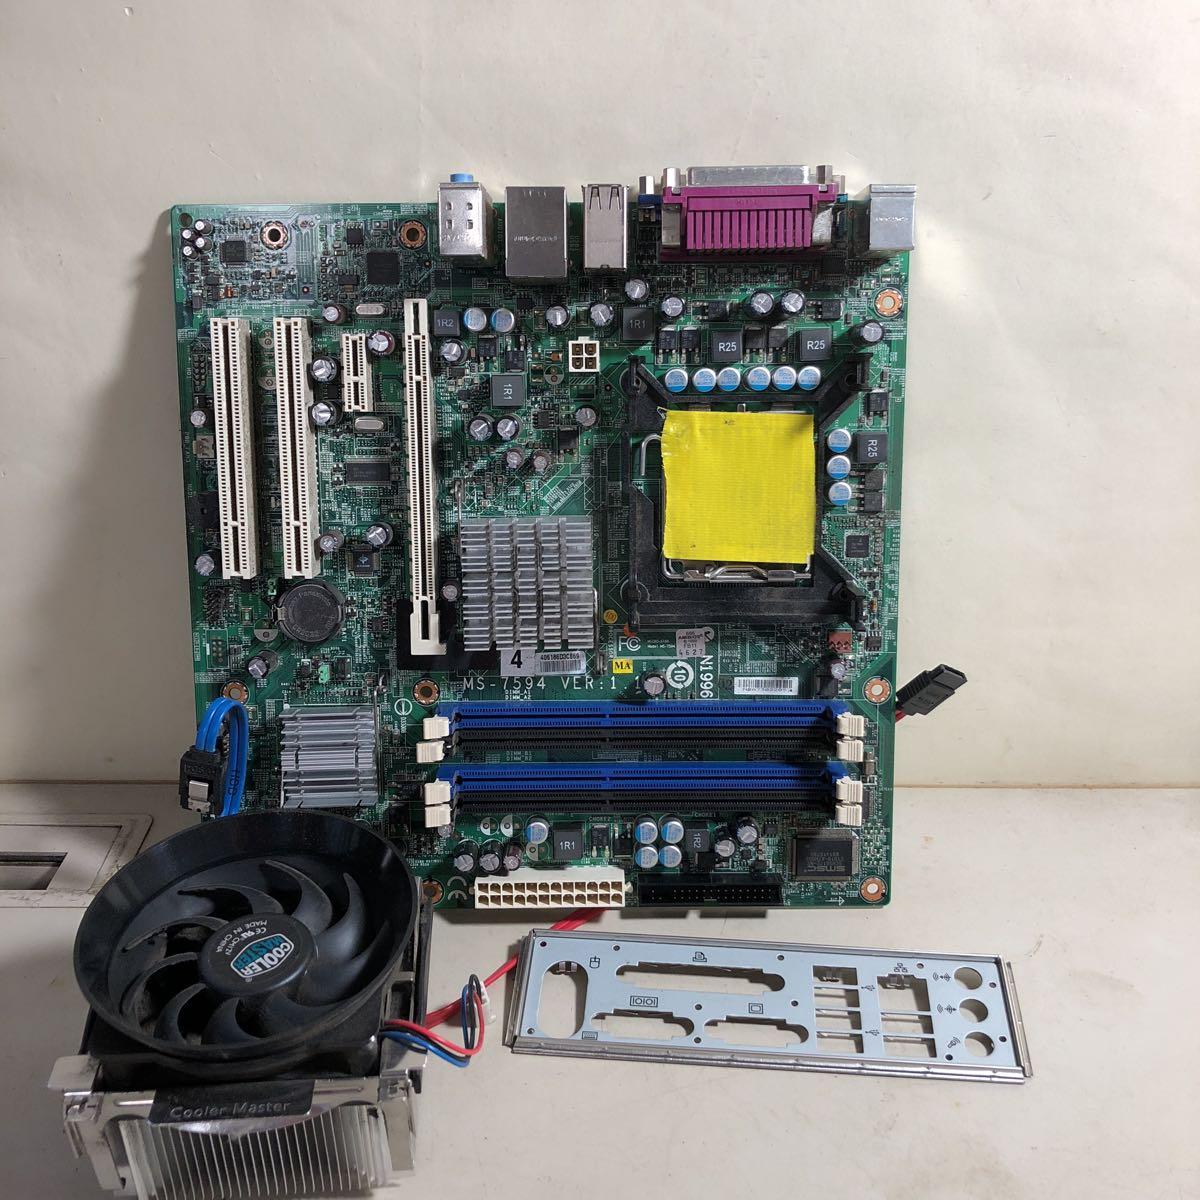 operation guarantee LGA775 MS-7594 Ver1 1 CPU cooler,air conditioner